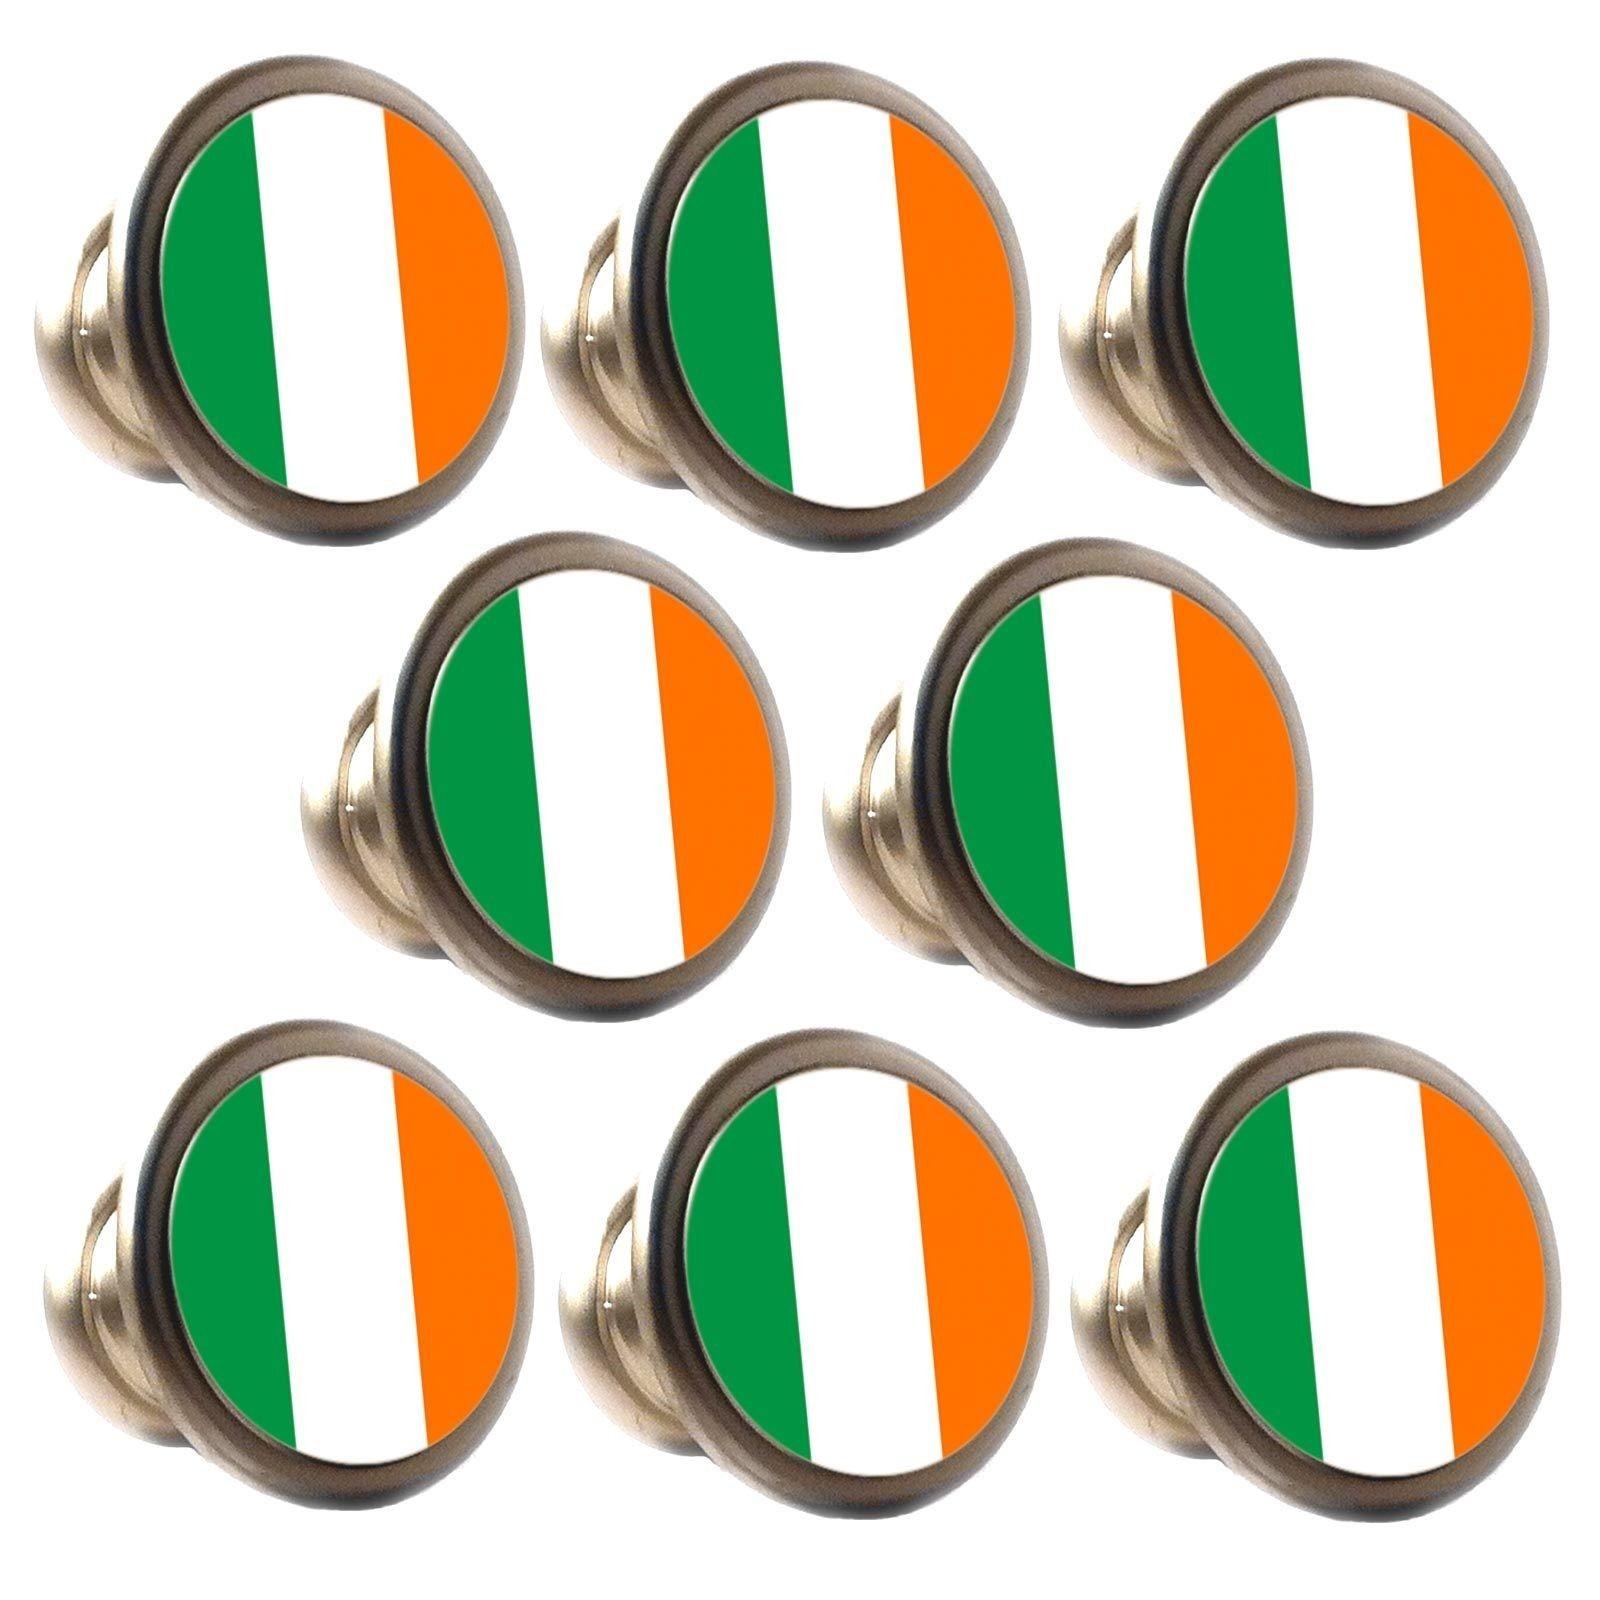 Zinc alloy knobs ireland flag 30mm cupboard drawer door handles variation of zinc alloy knobs ireland flag 30mm buycottarizona Gallery